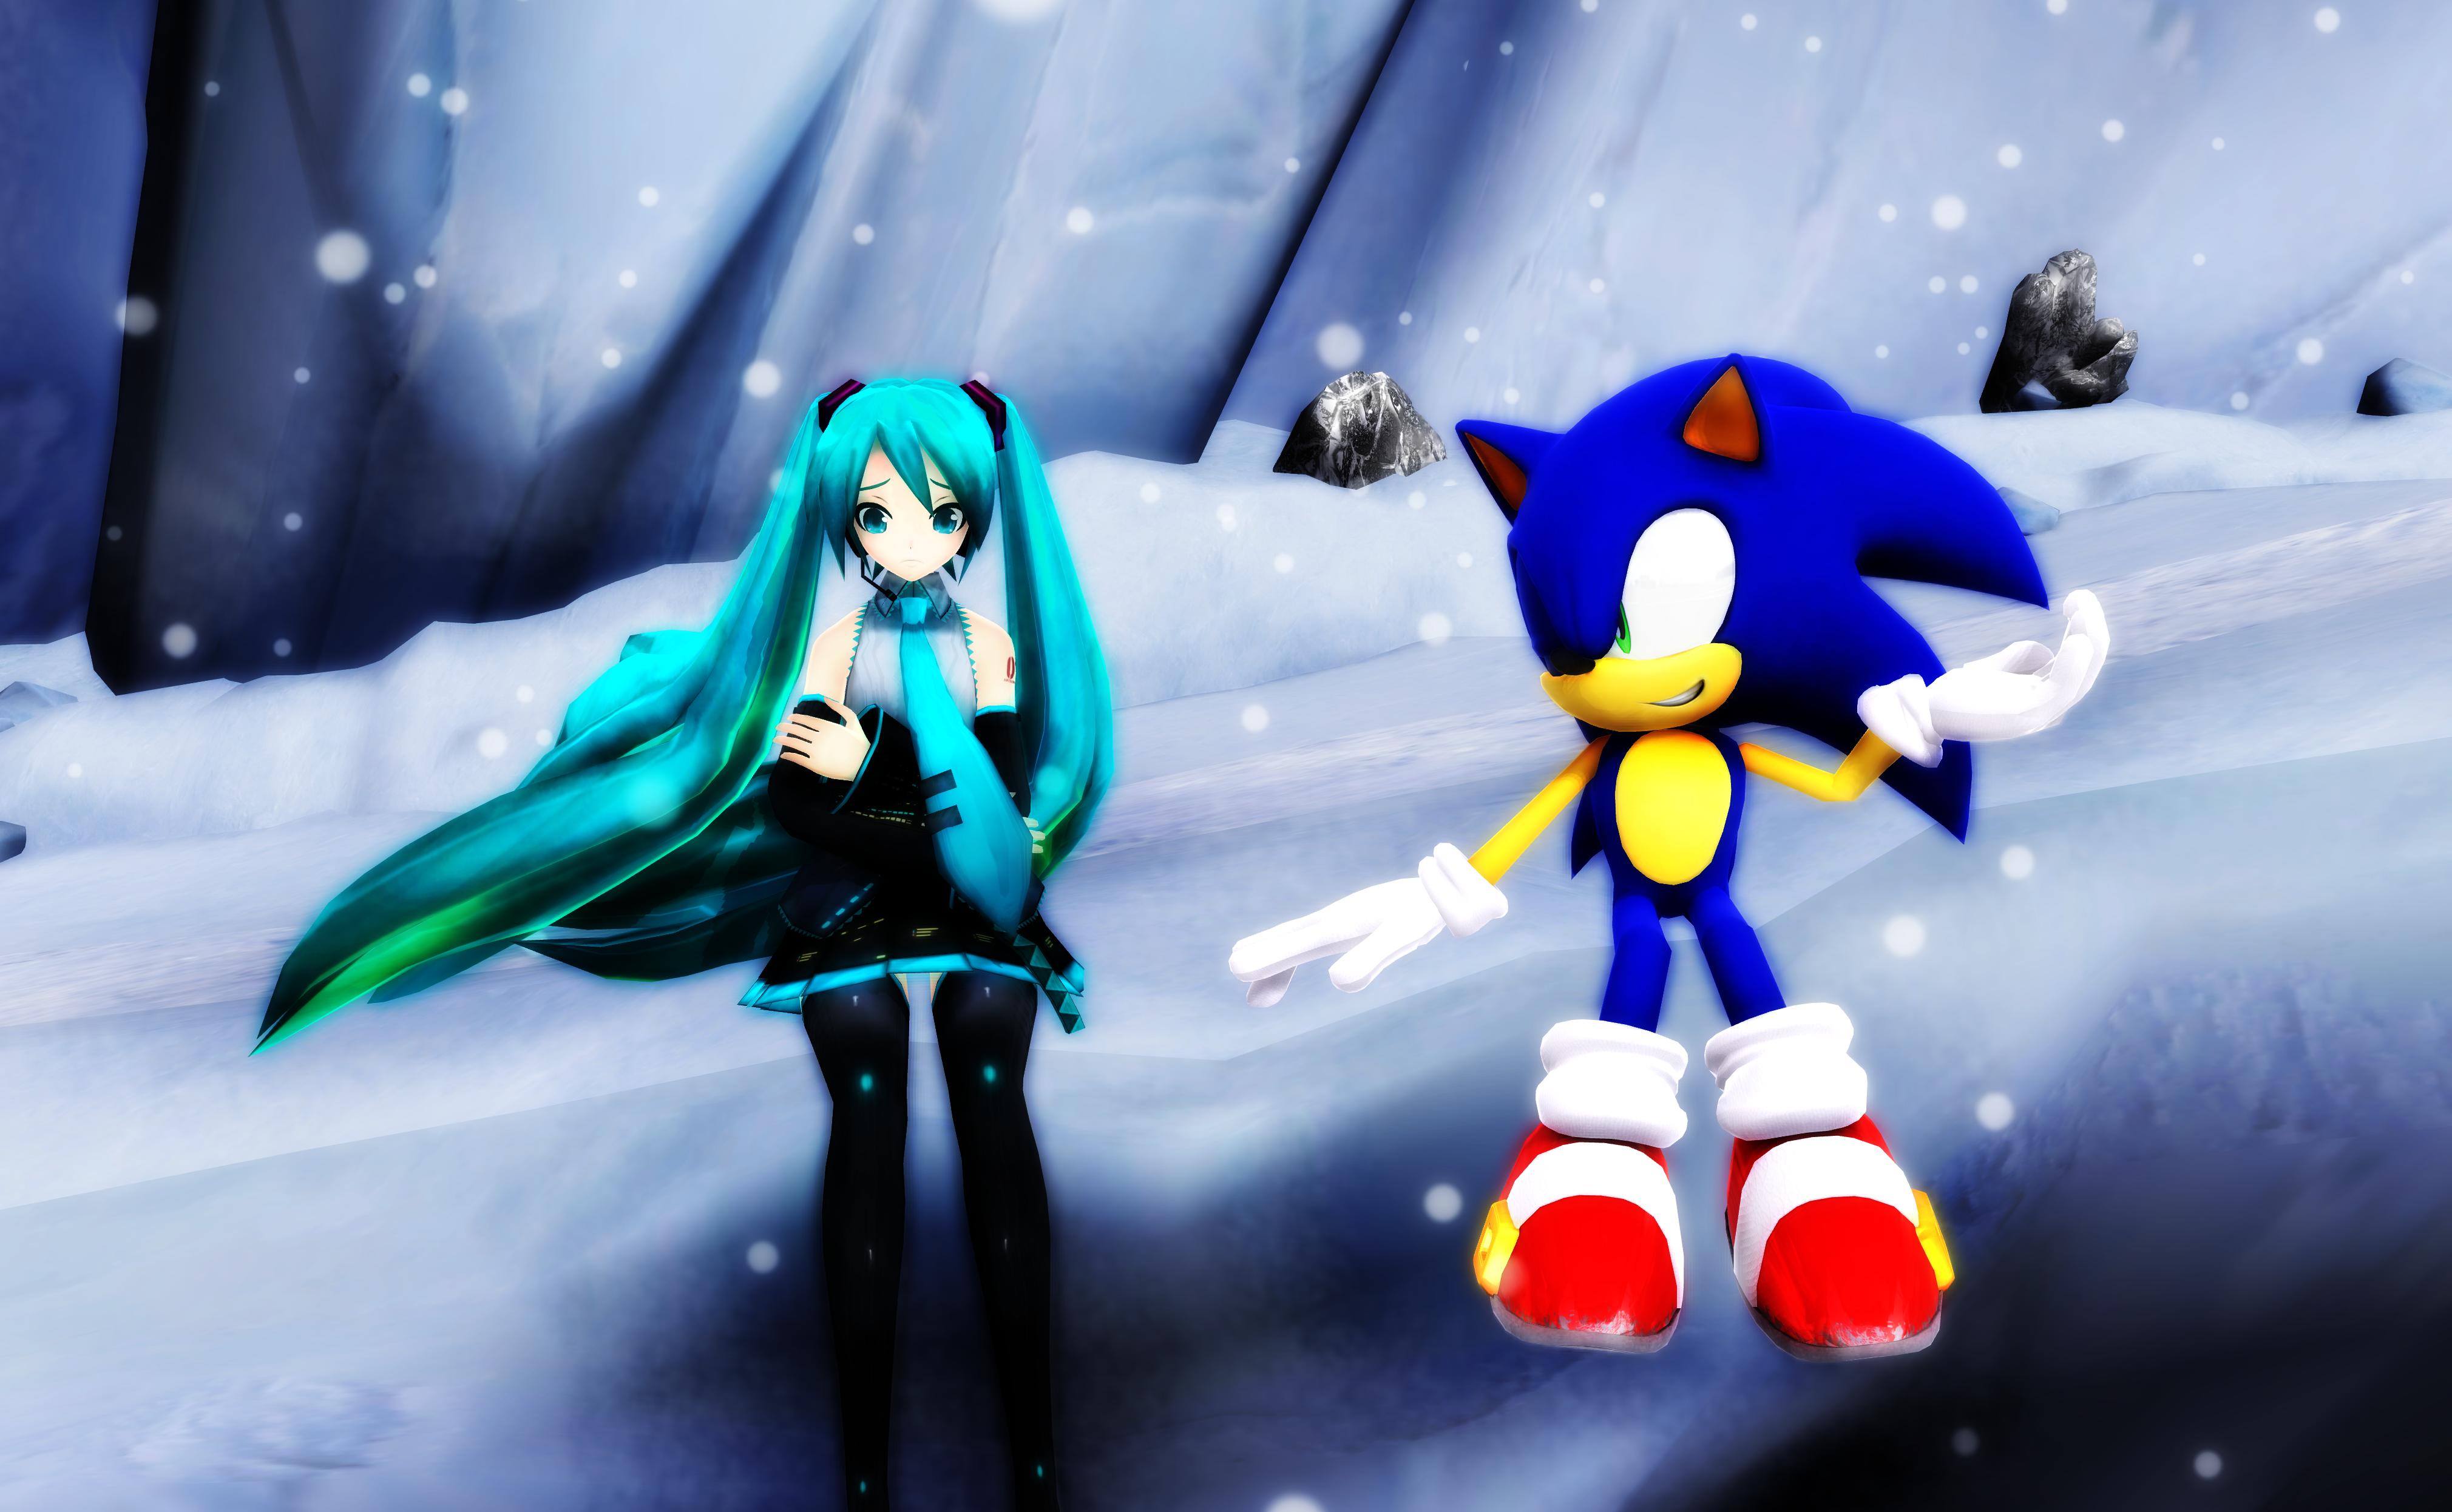 A cool world by BluexBlur